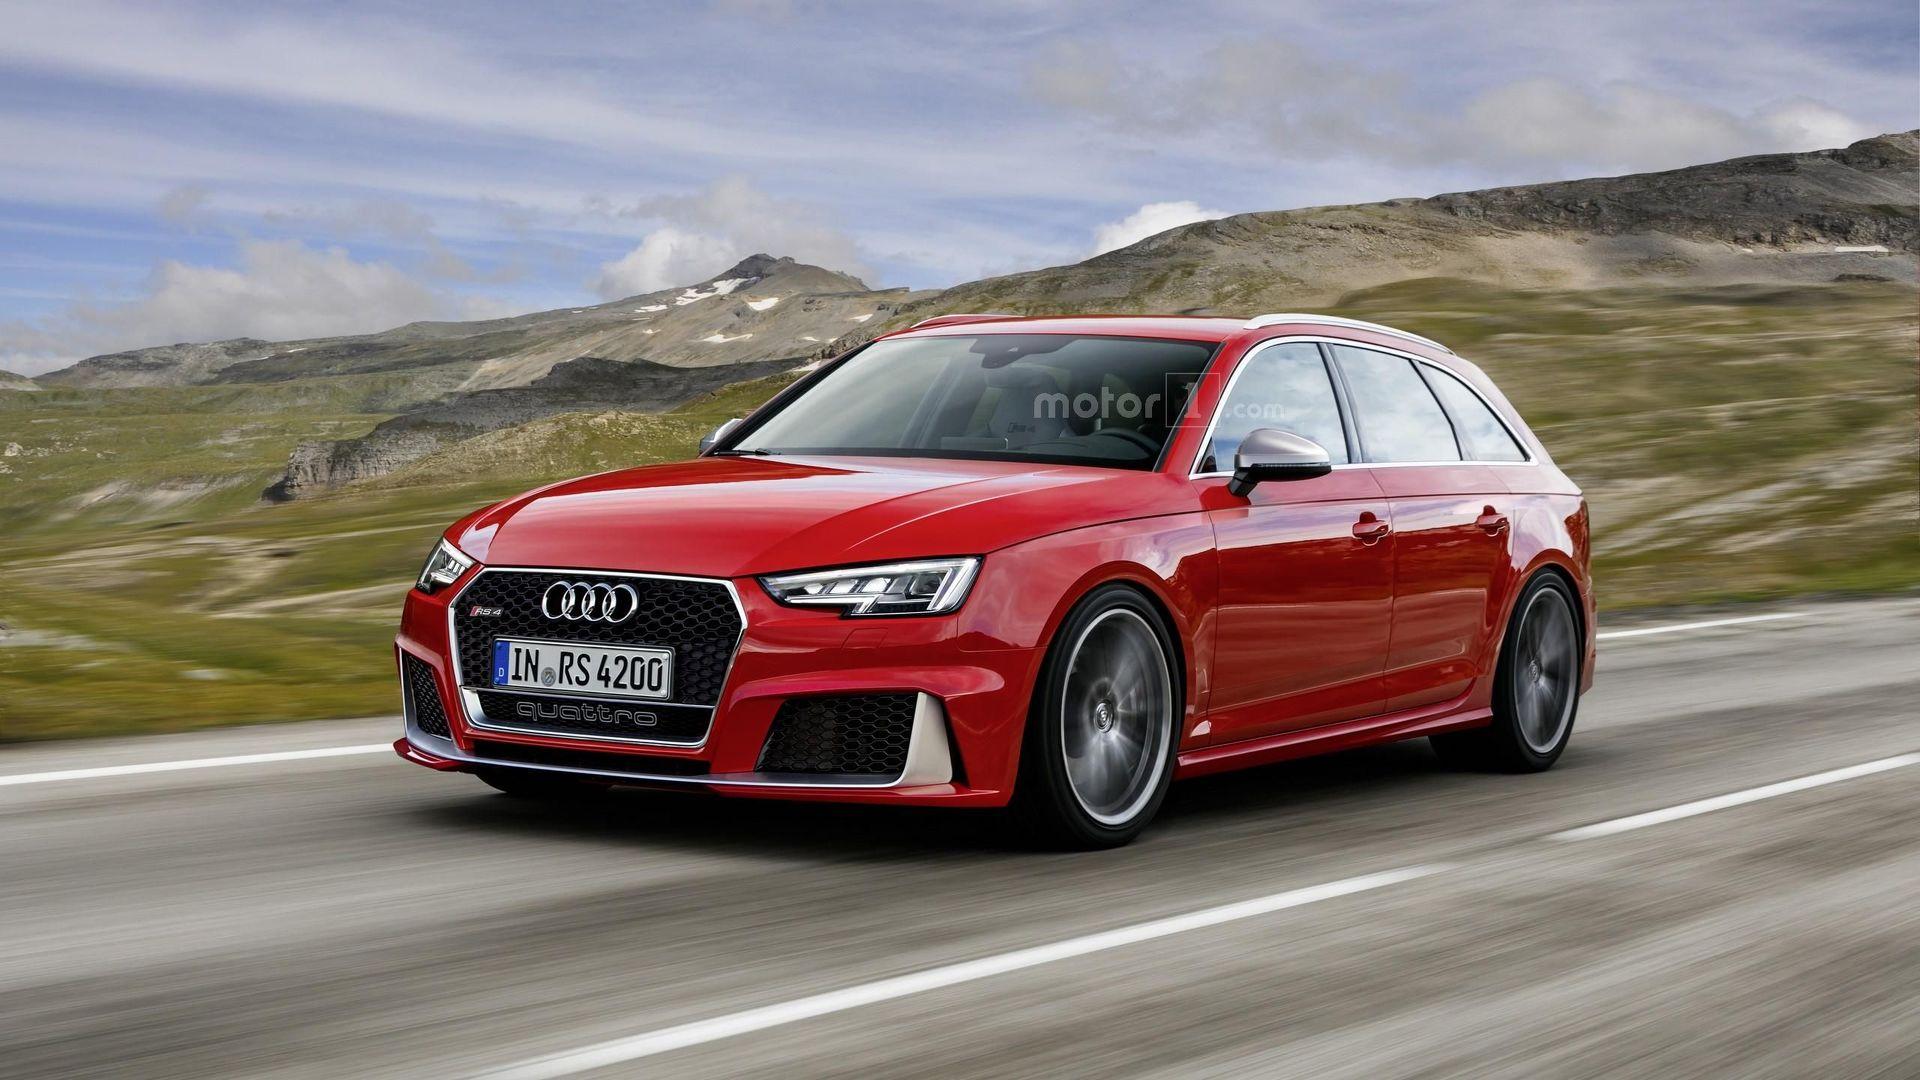 Audi RS Avant RS CoupeSportback Specs Leaked Via Dealer - Audi rs4